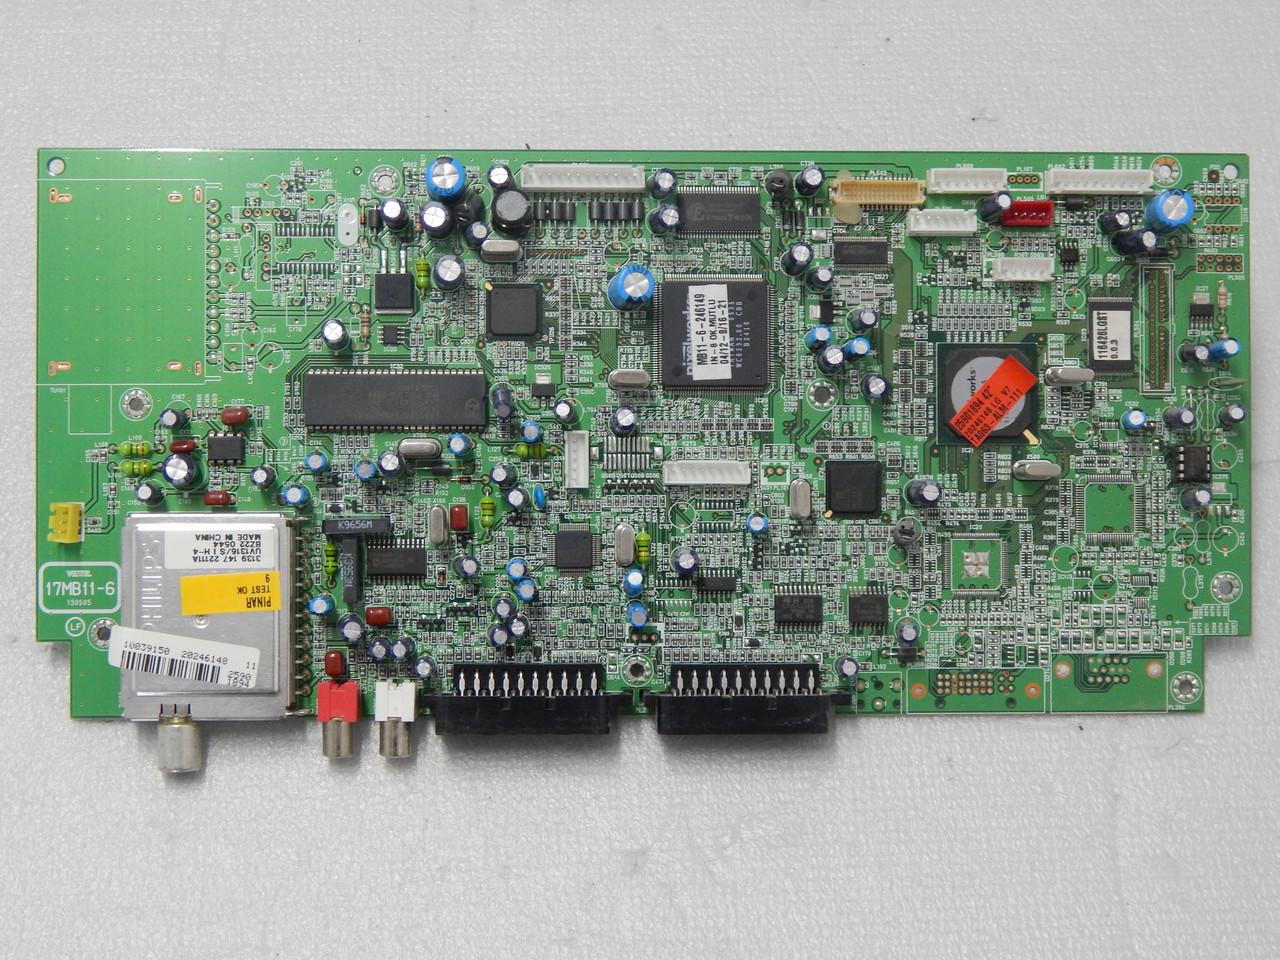 MAIN  BOARD 17MB11-6 для телевизора dual dptv 4210,LGV7